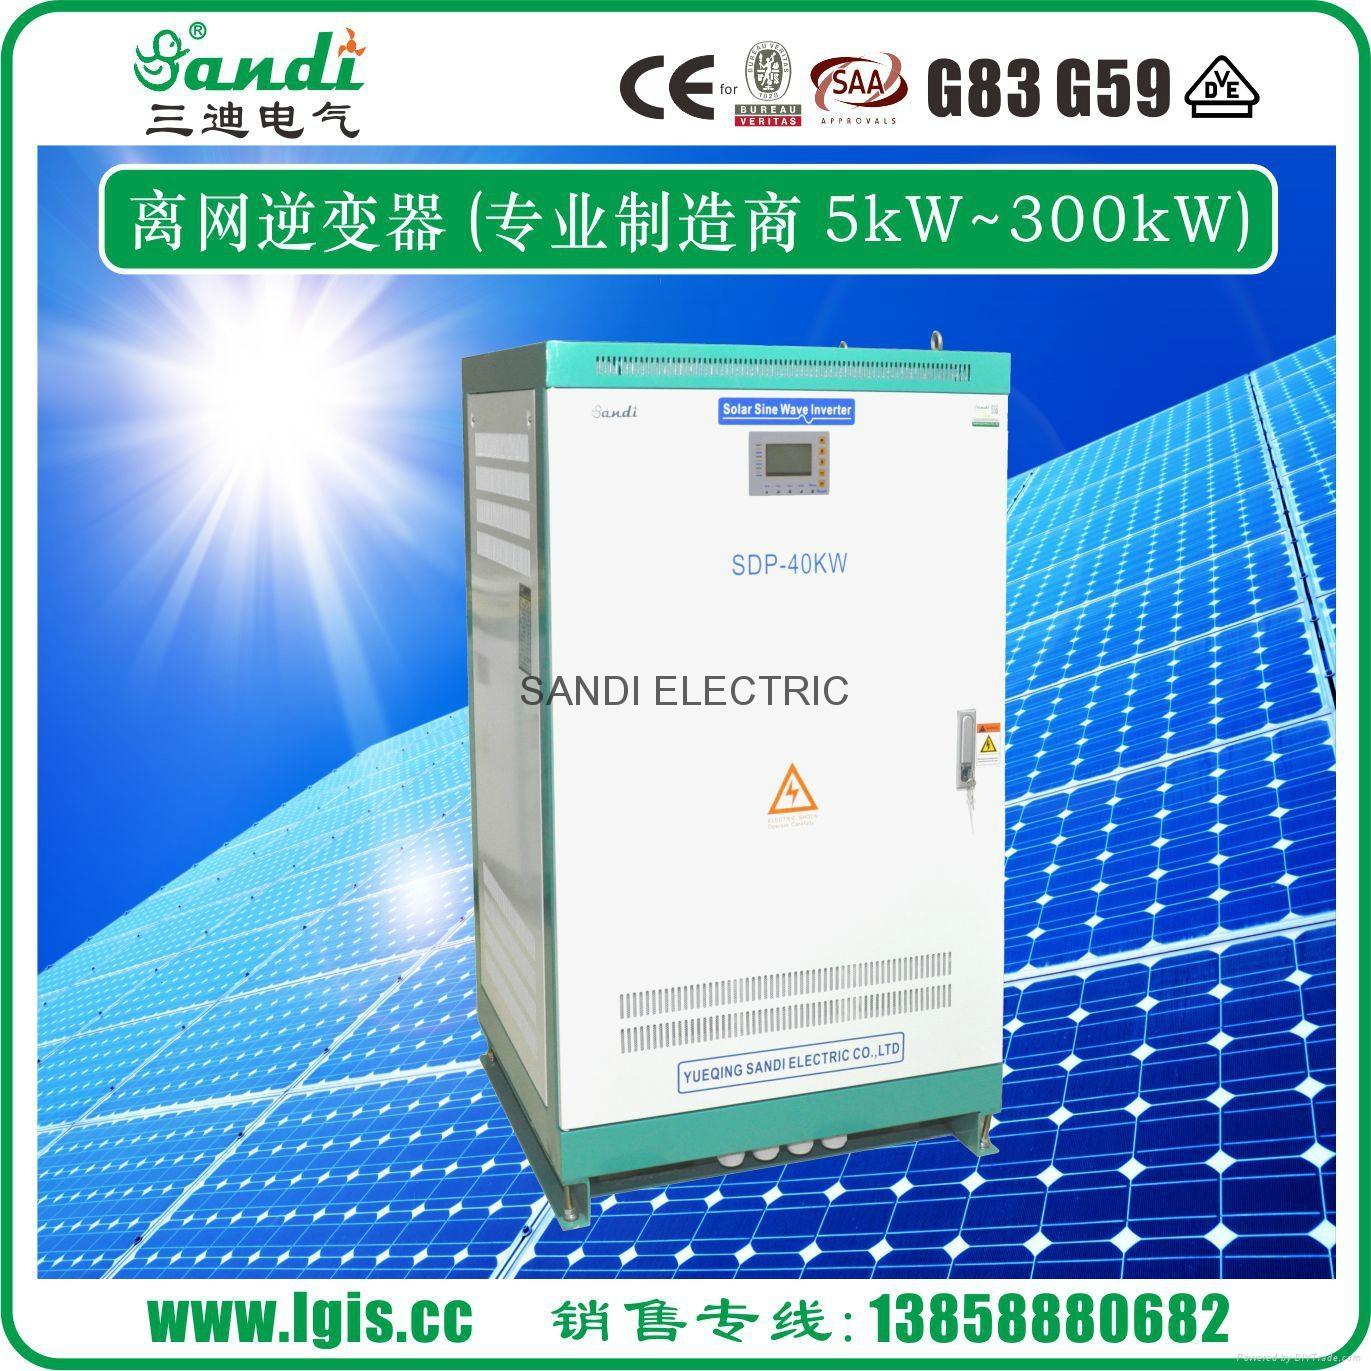 40kW off grid battery inverter for 3 phase hybrid load use